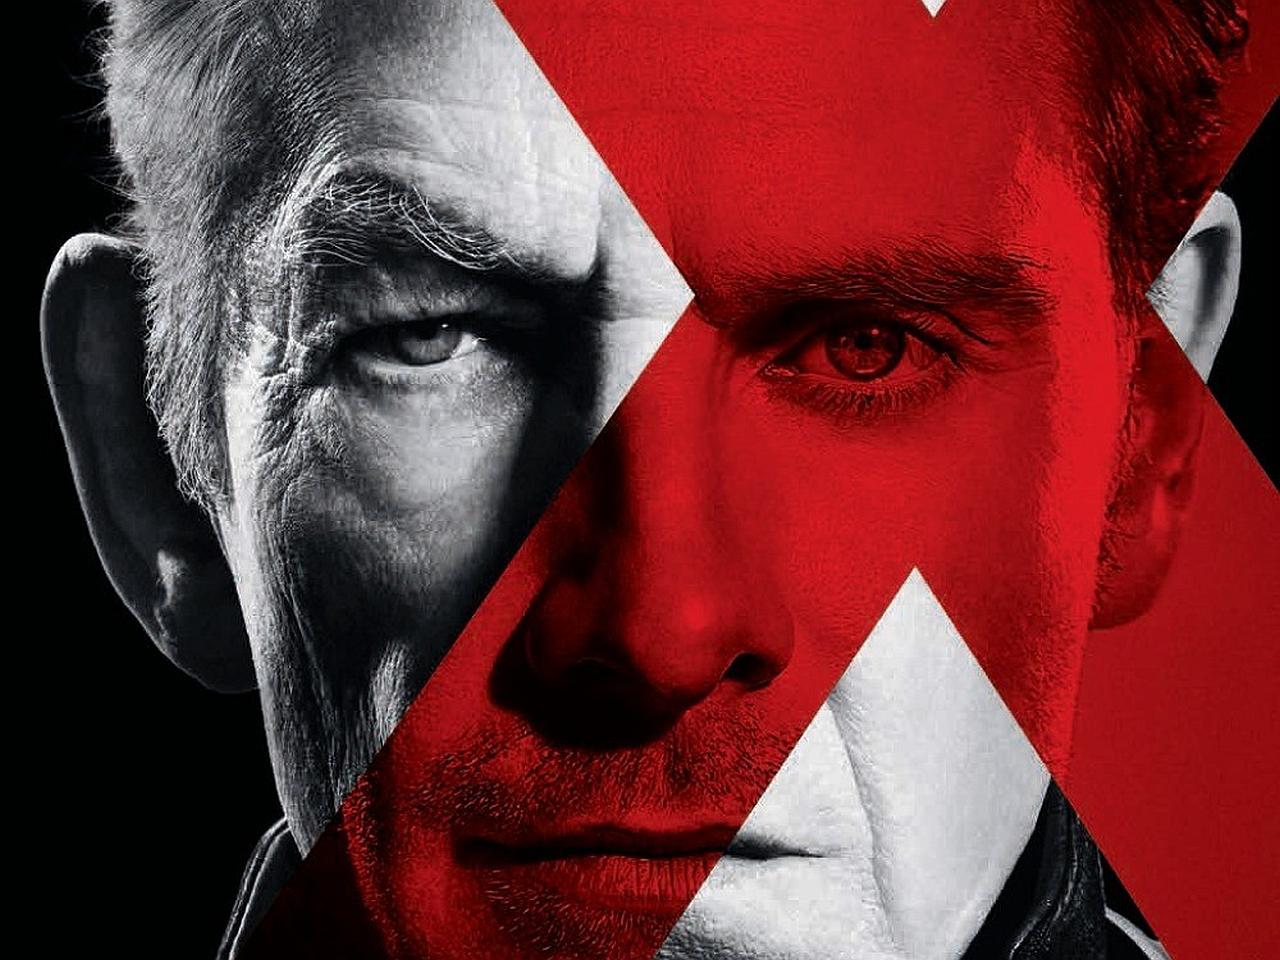 X Men Days Of Future Past Wallpapers X Men Wallpaper